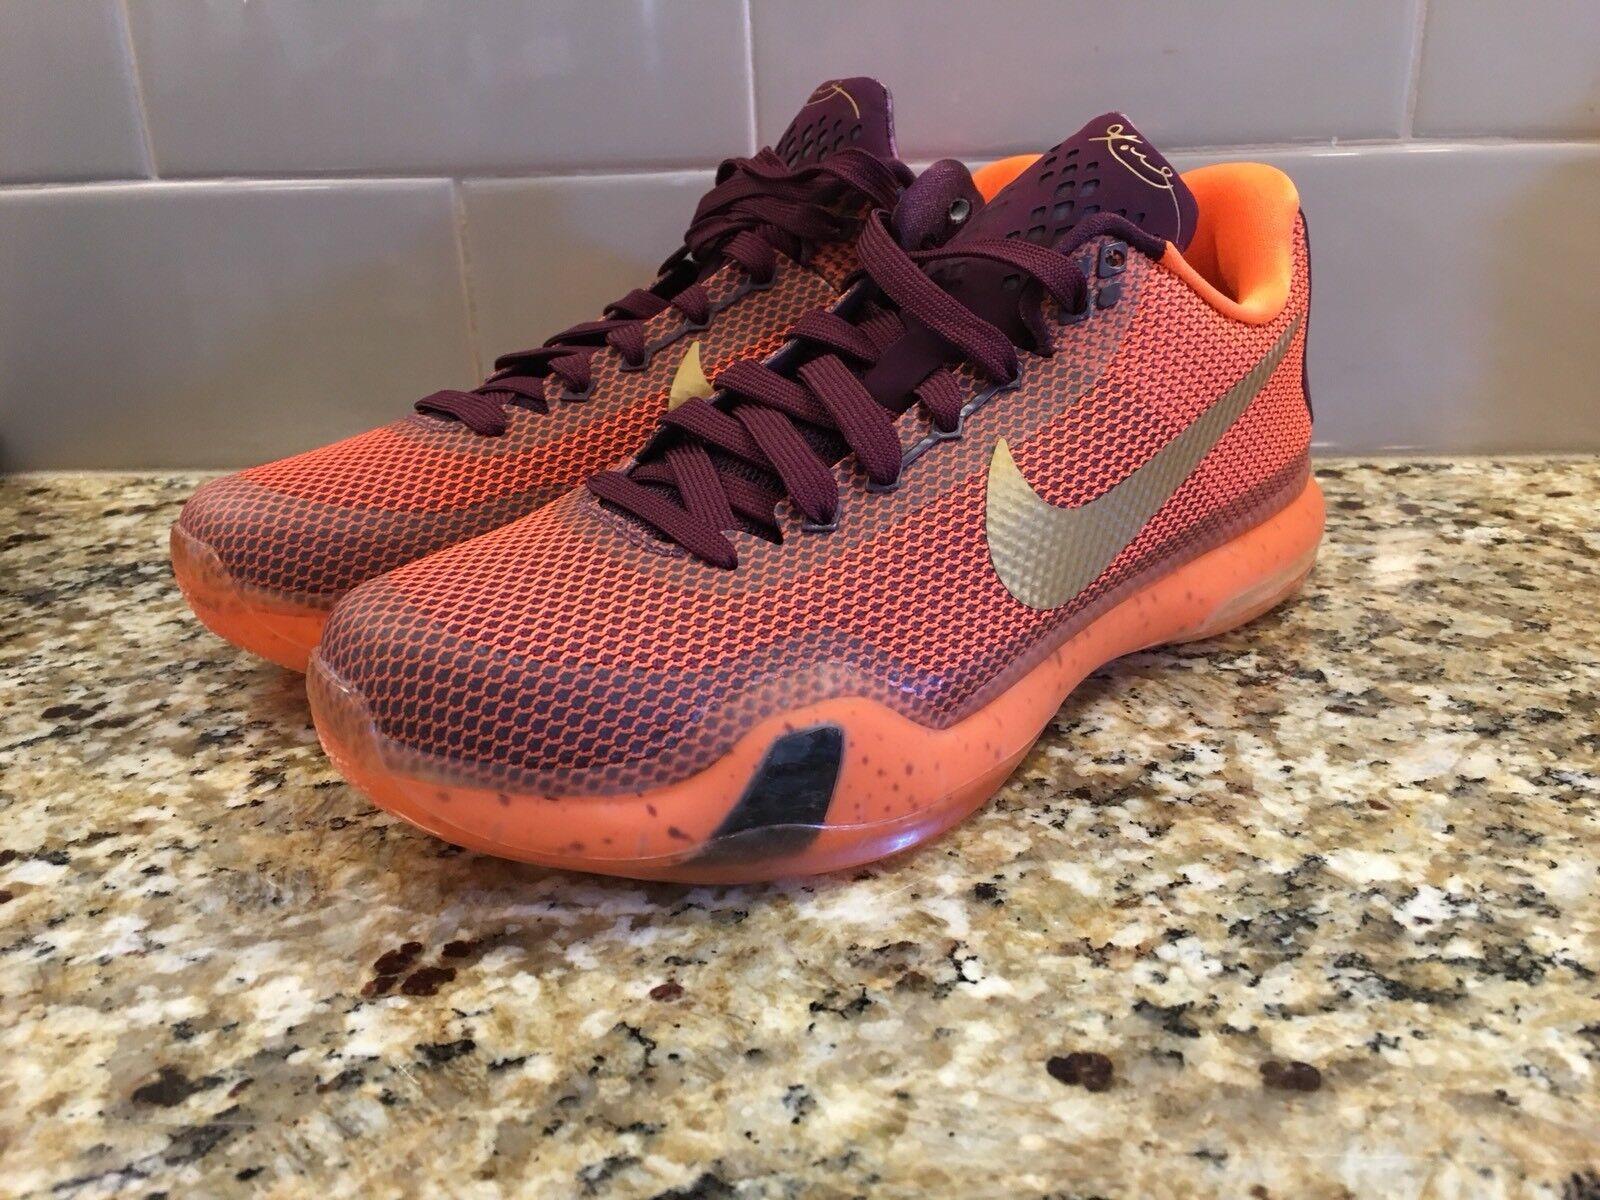 Nike - x 10 seta arancione Uomo sz 705317-676 nuove scarpe da basket